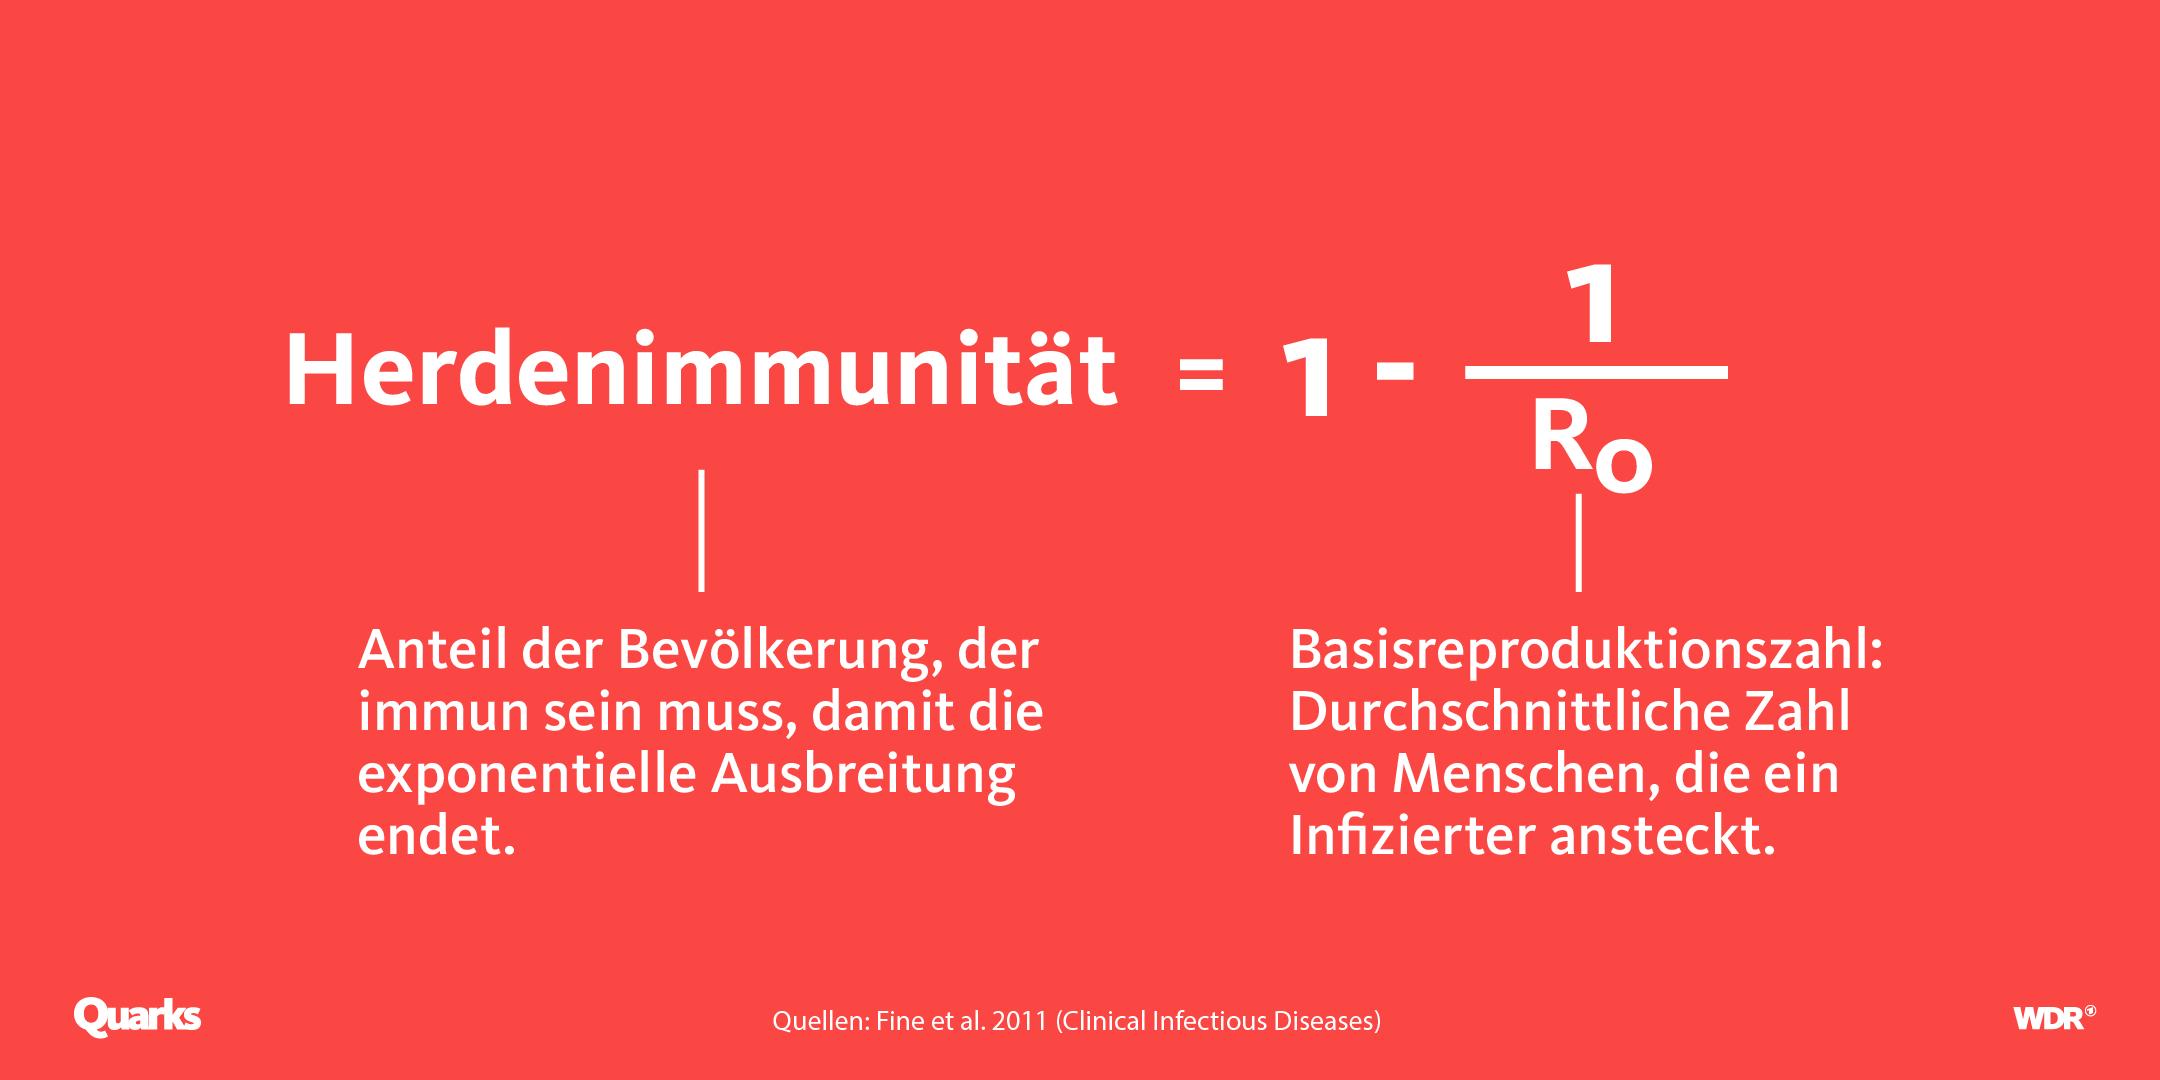 Herdenimmunität = 1 - 1/R0